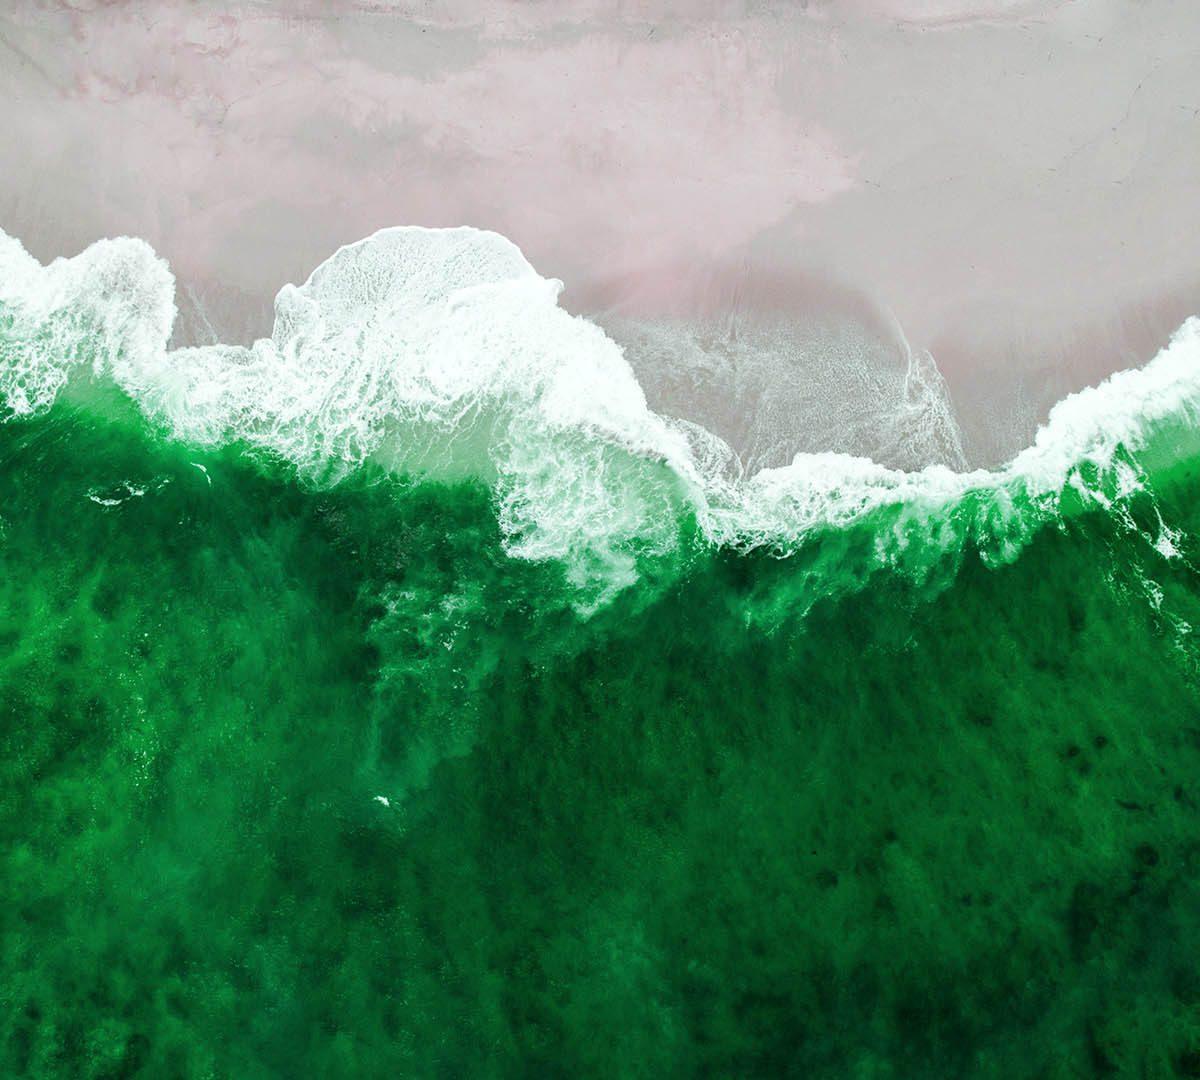 ocean colors - shifaaz shamoon - unsplash